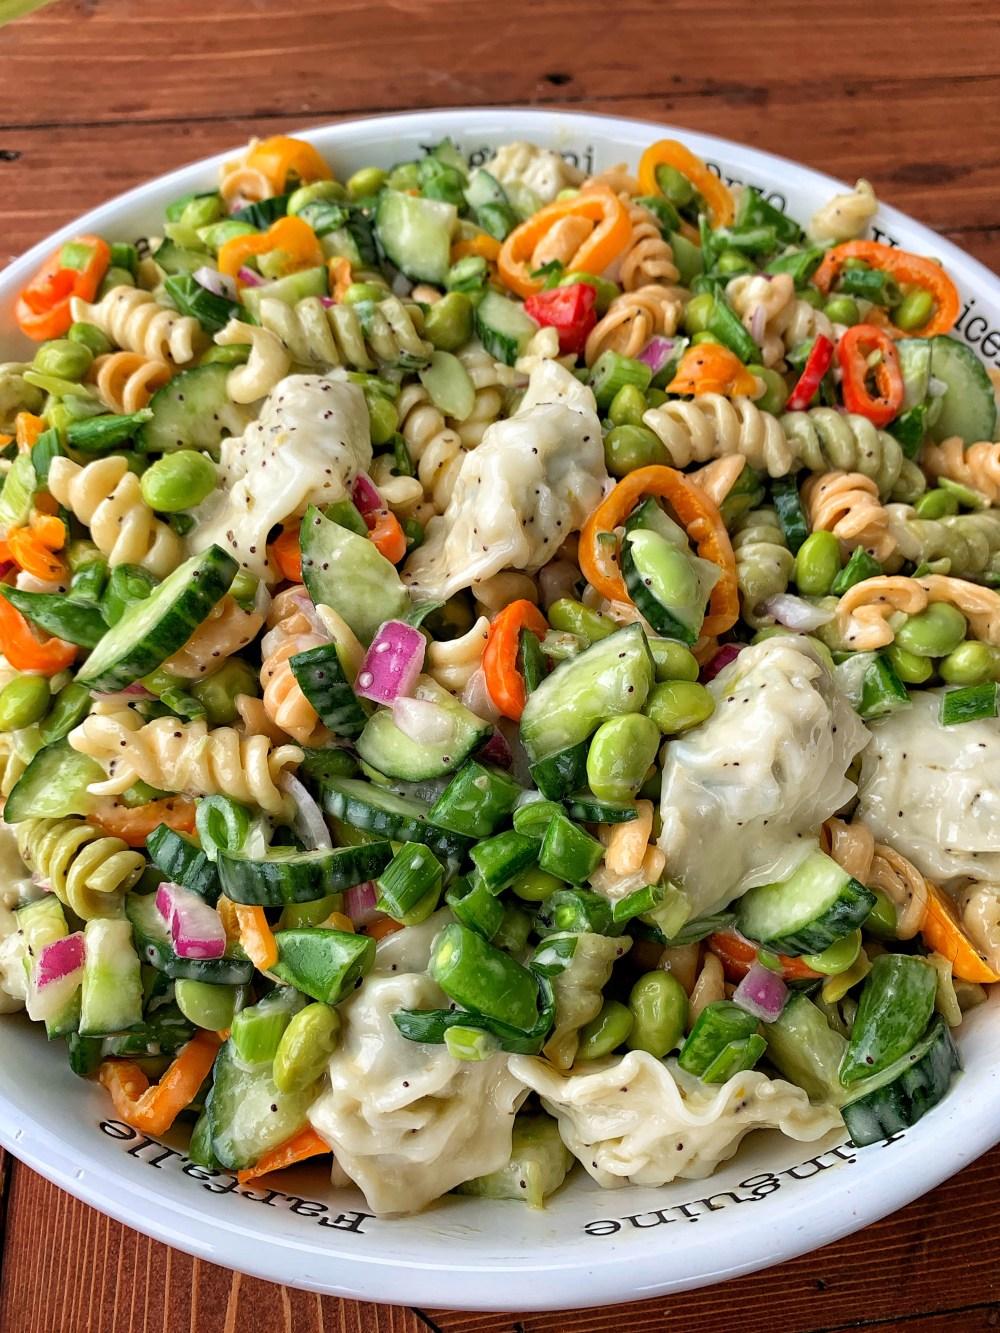 A bowl of veggies and corkscrew pasta.